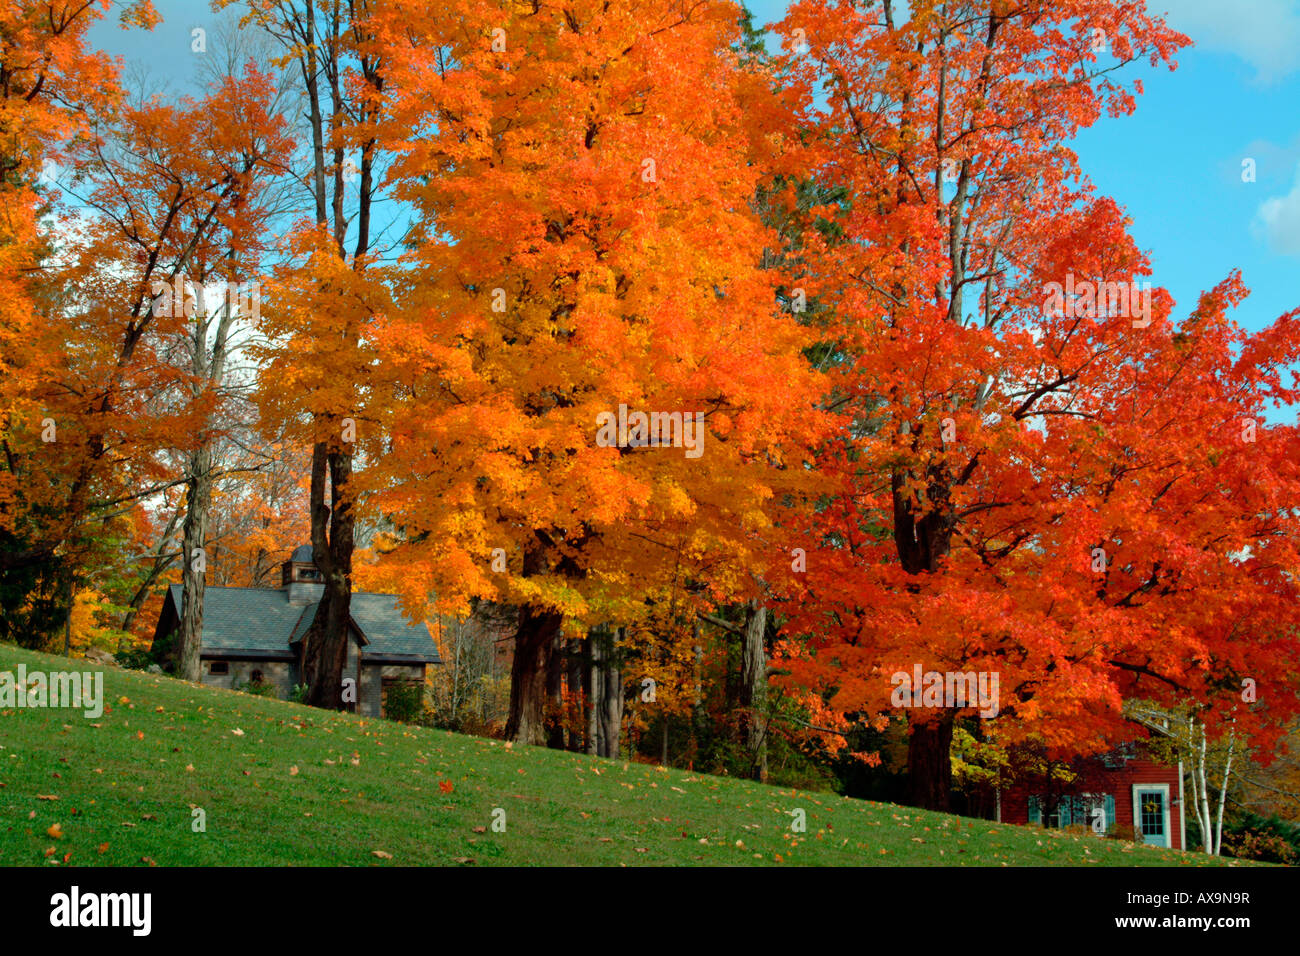 Luminous Fall foliage dominating New England houses - Stock Image